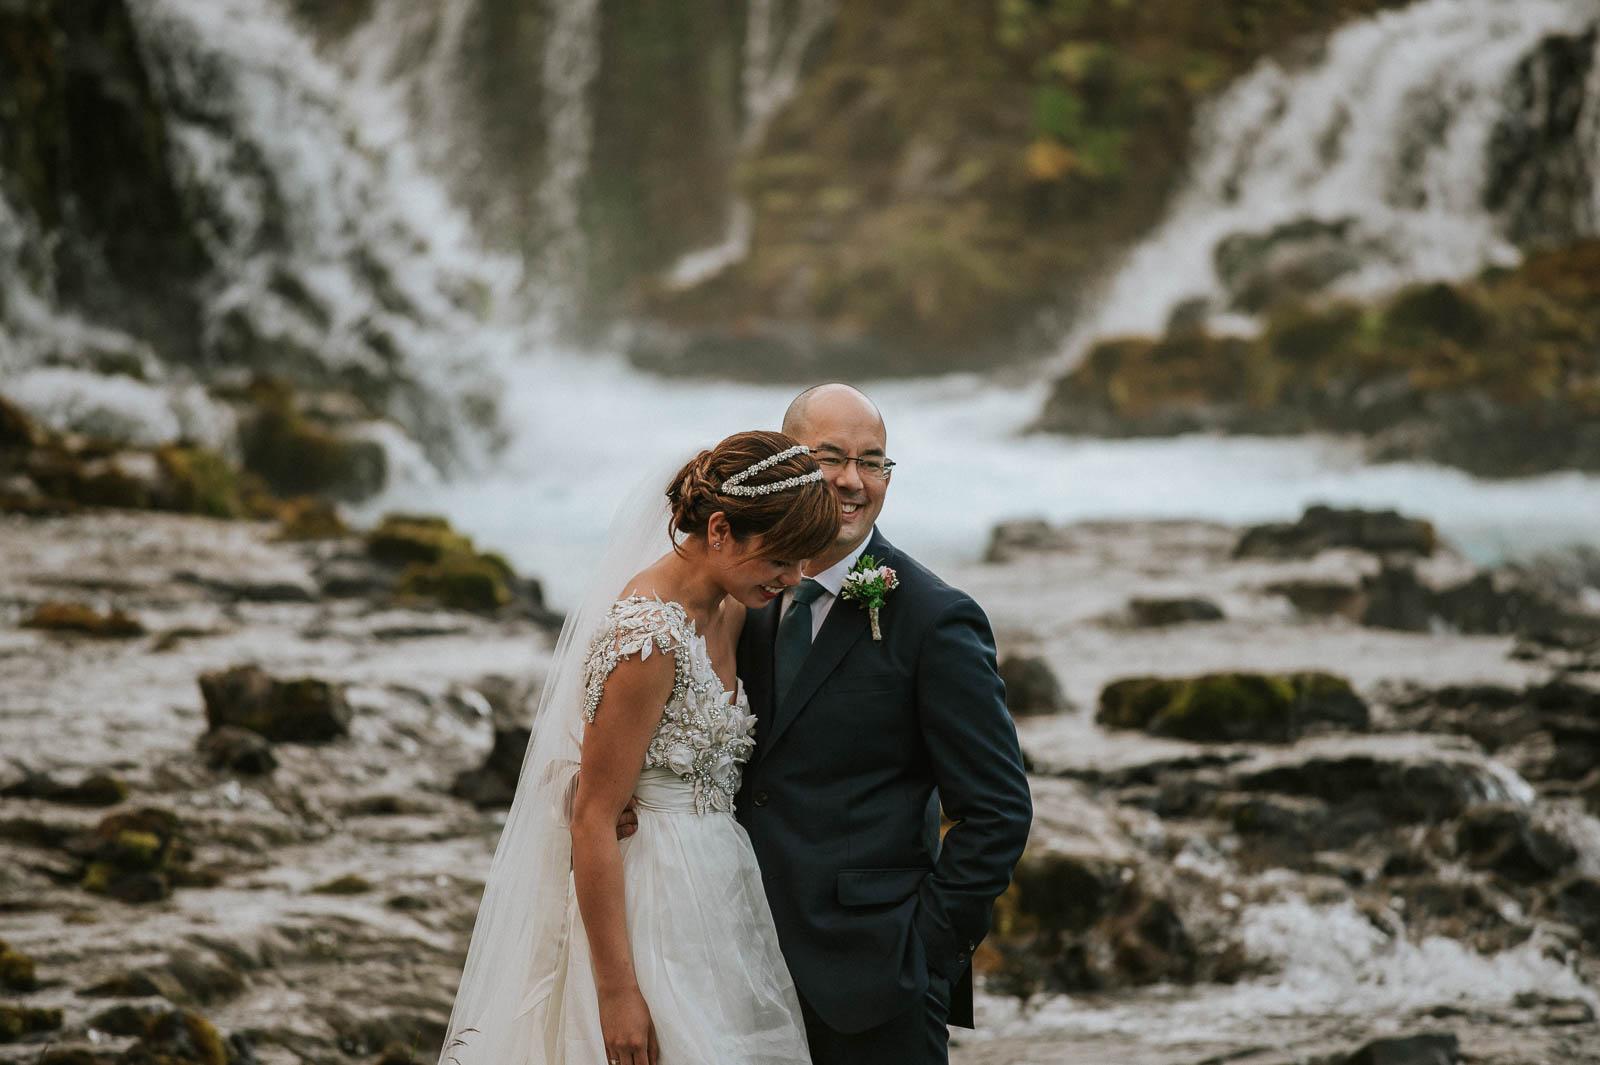 29-iceland-elopement